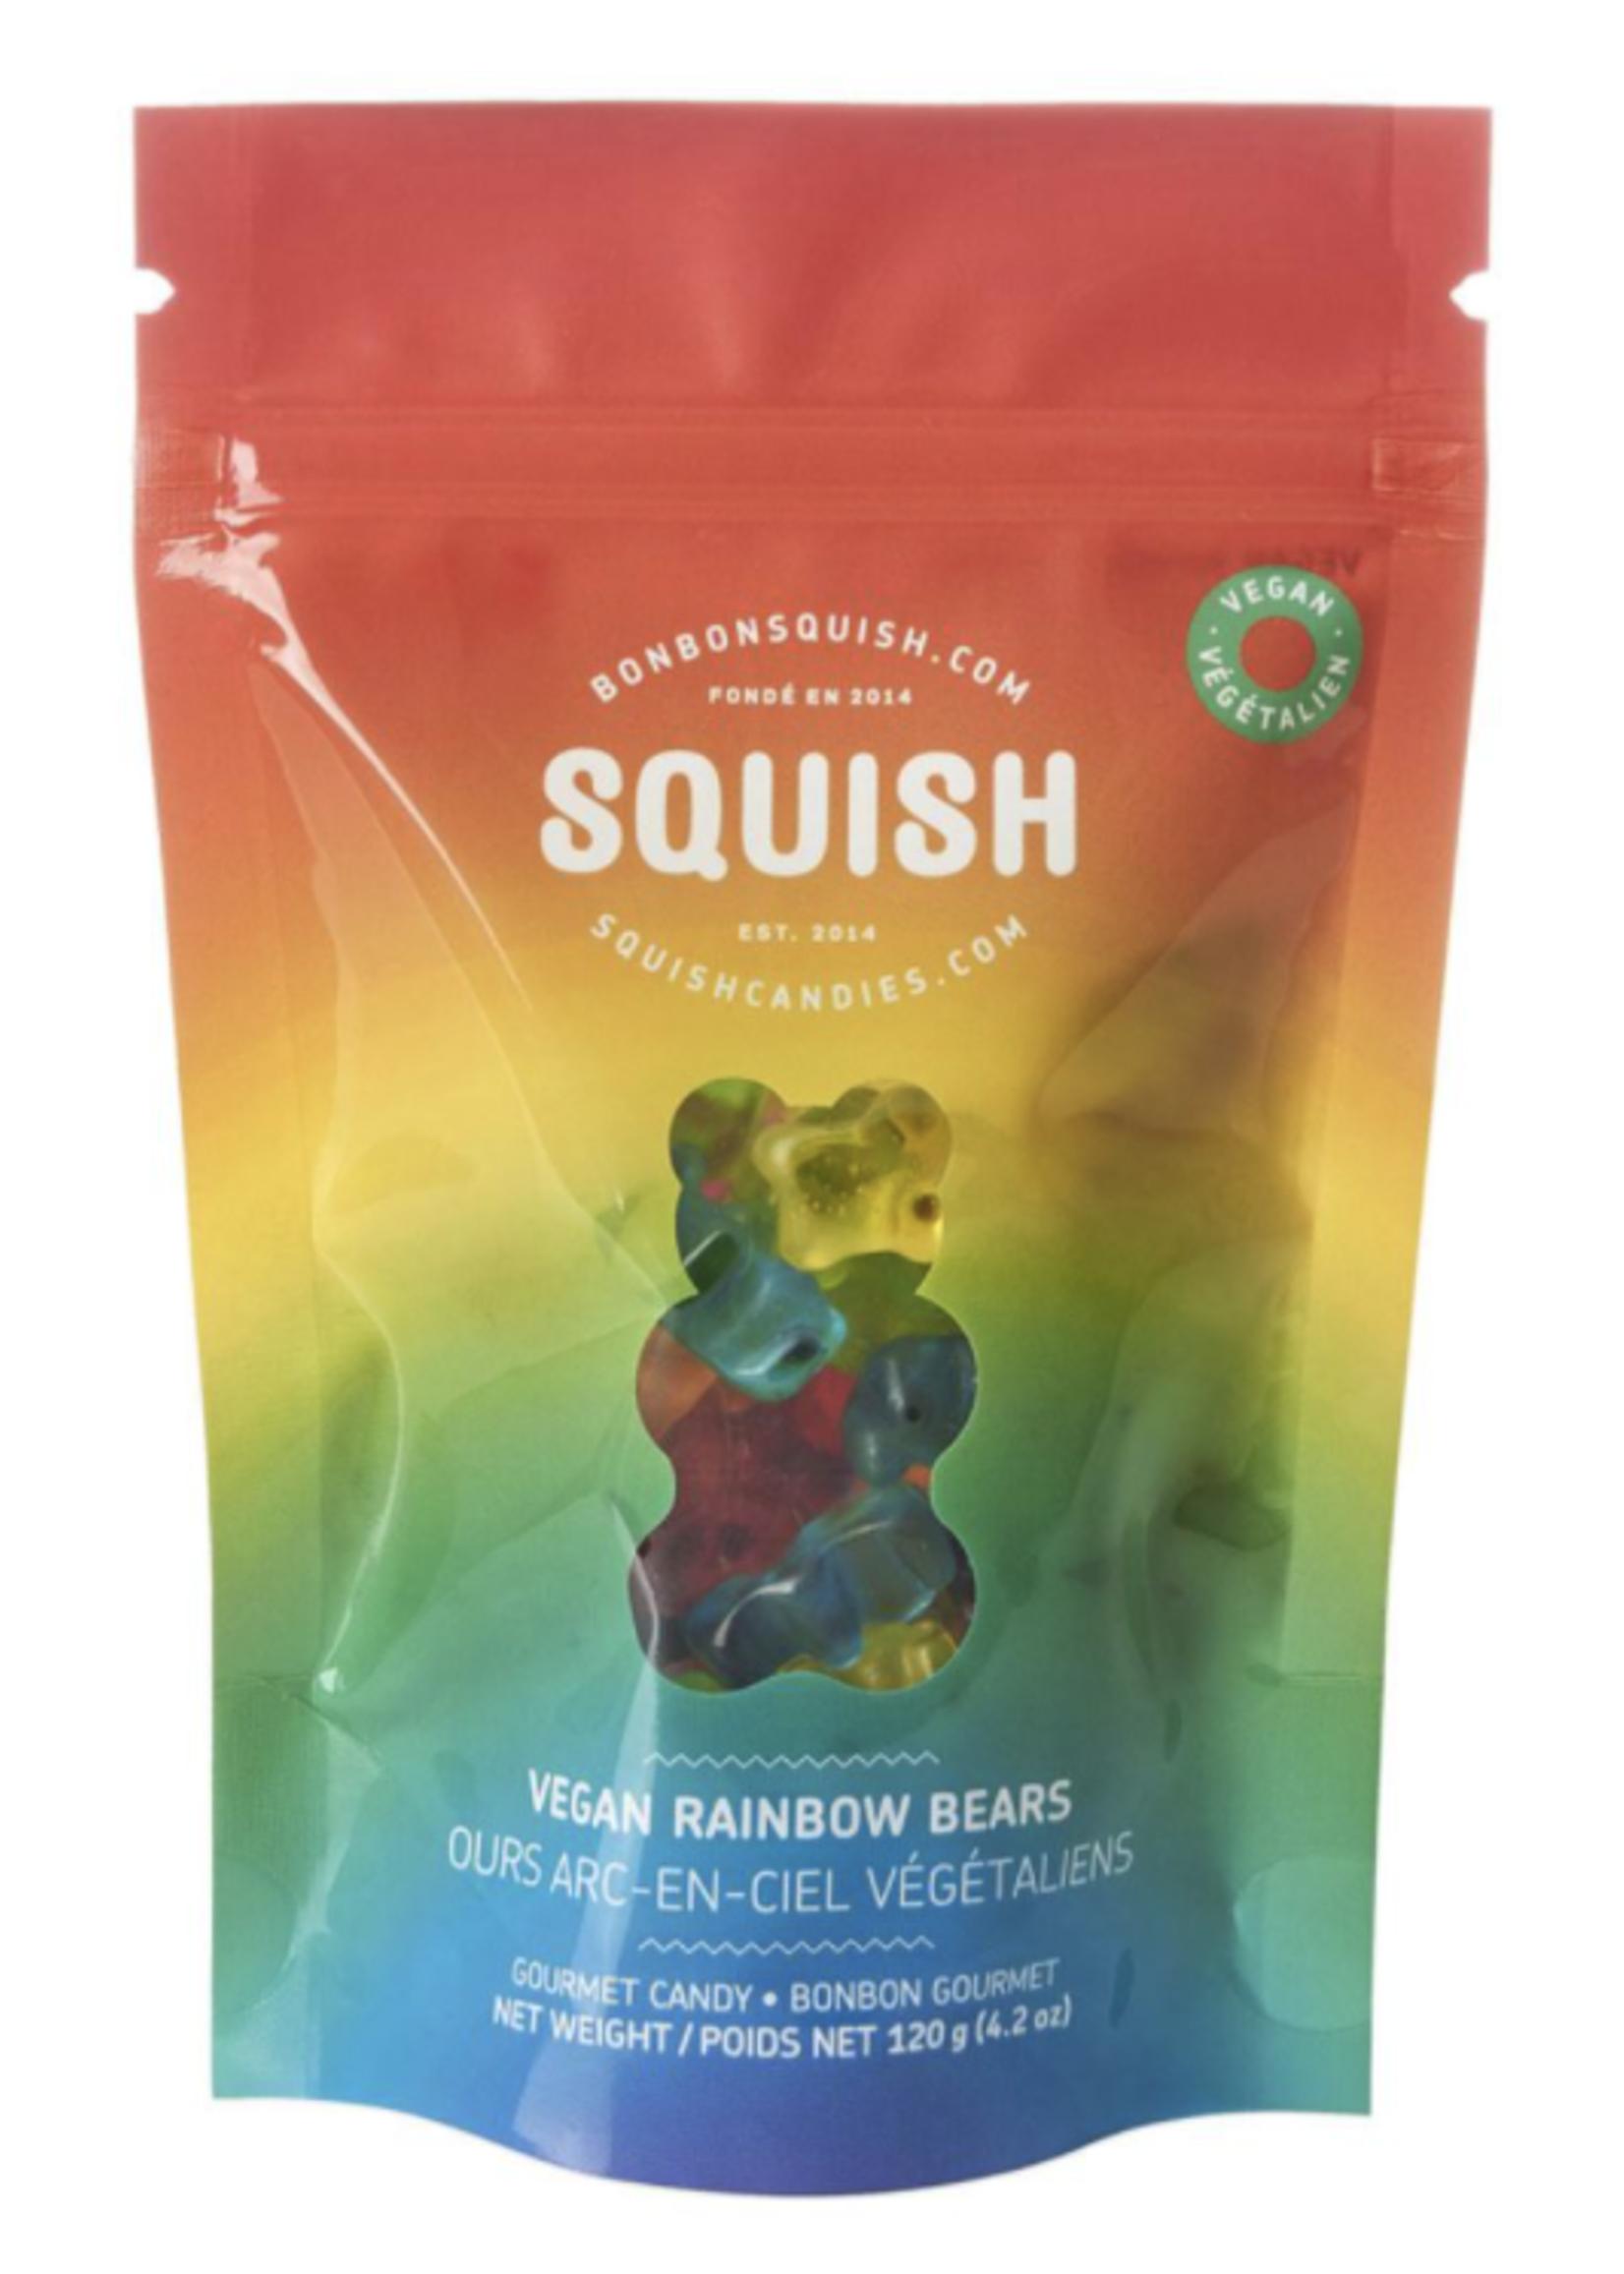 Squish Candy Vegan Rainbow Bears